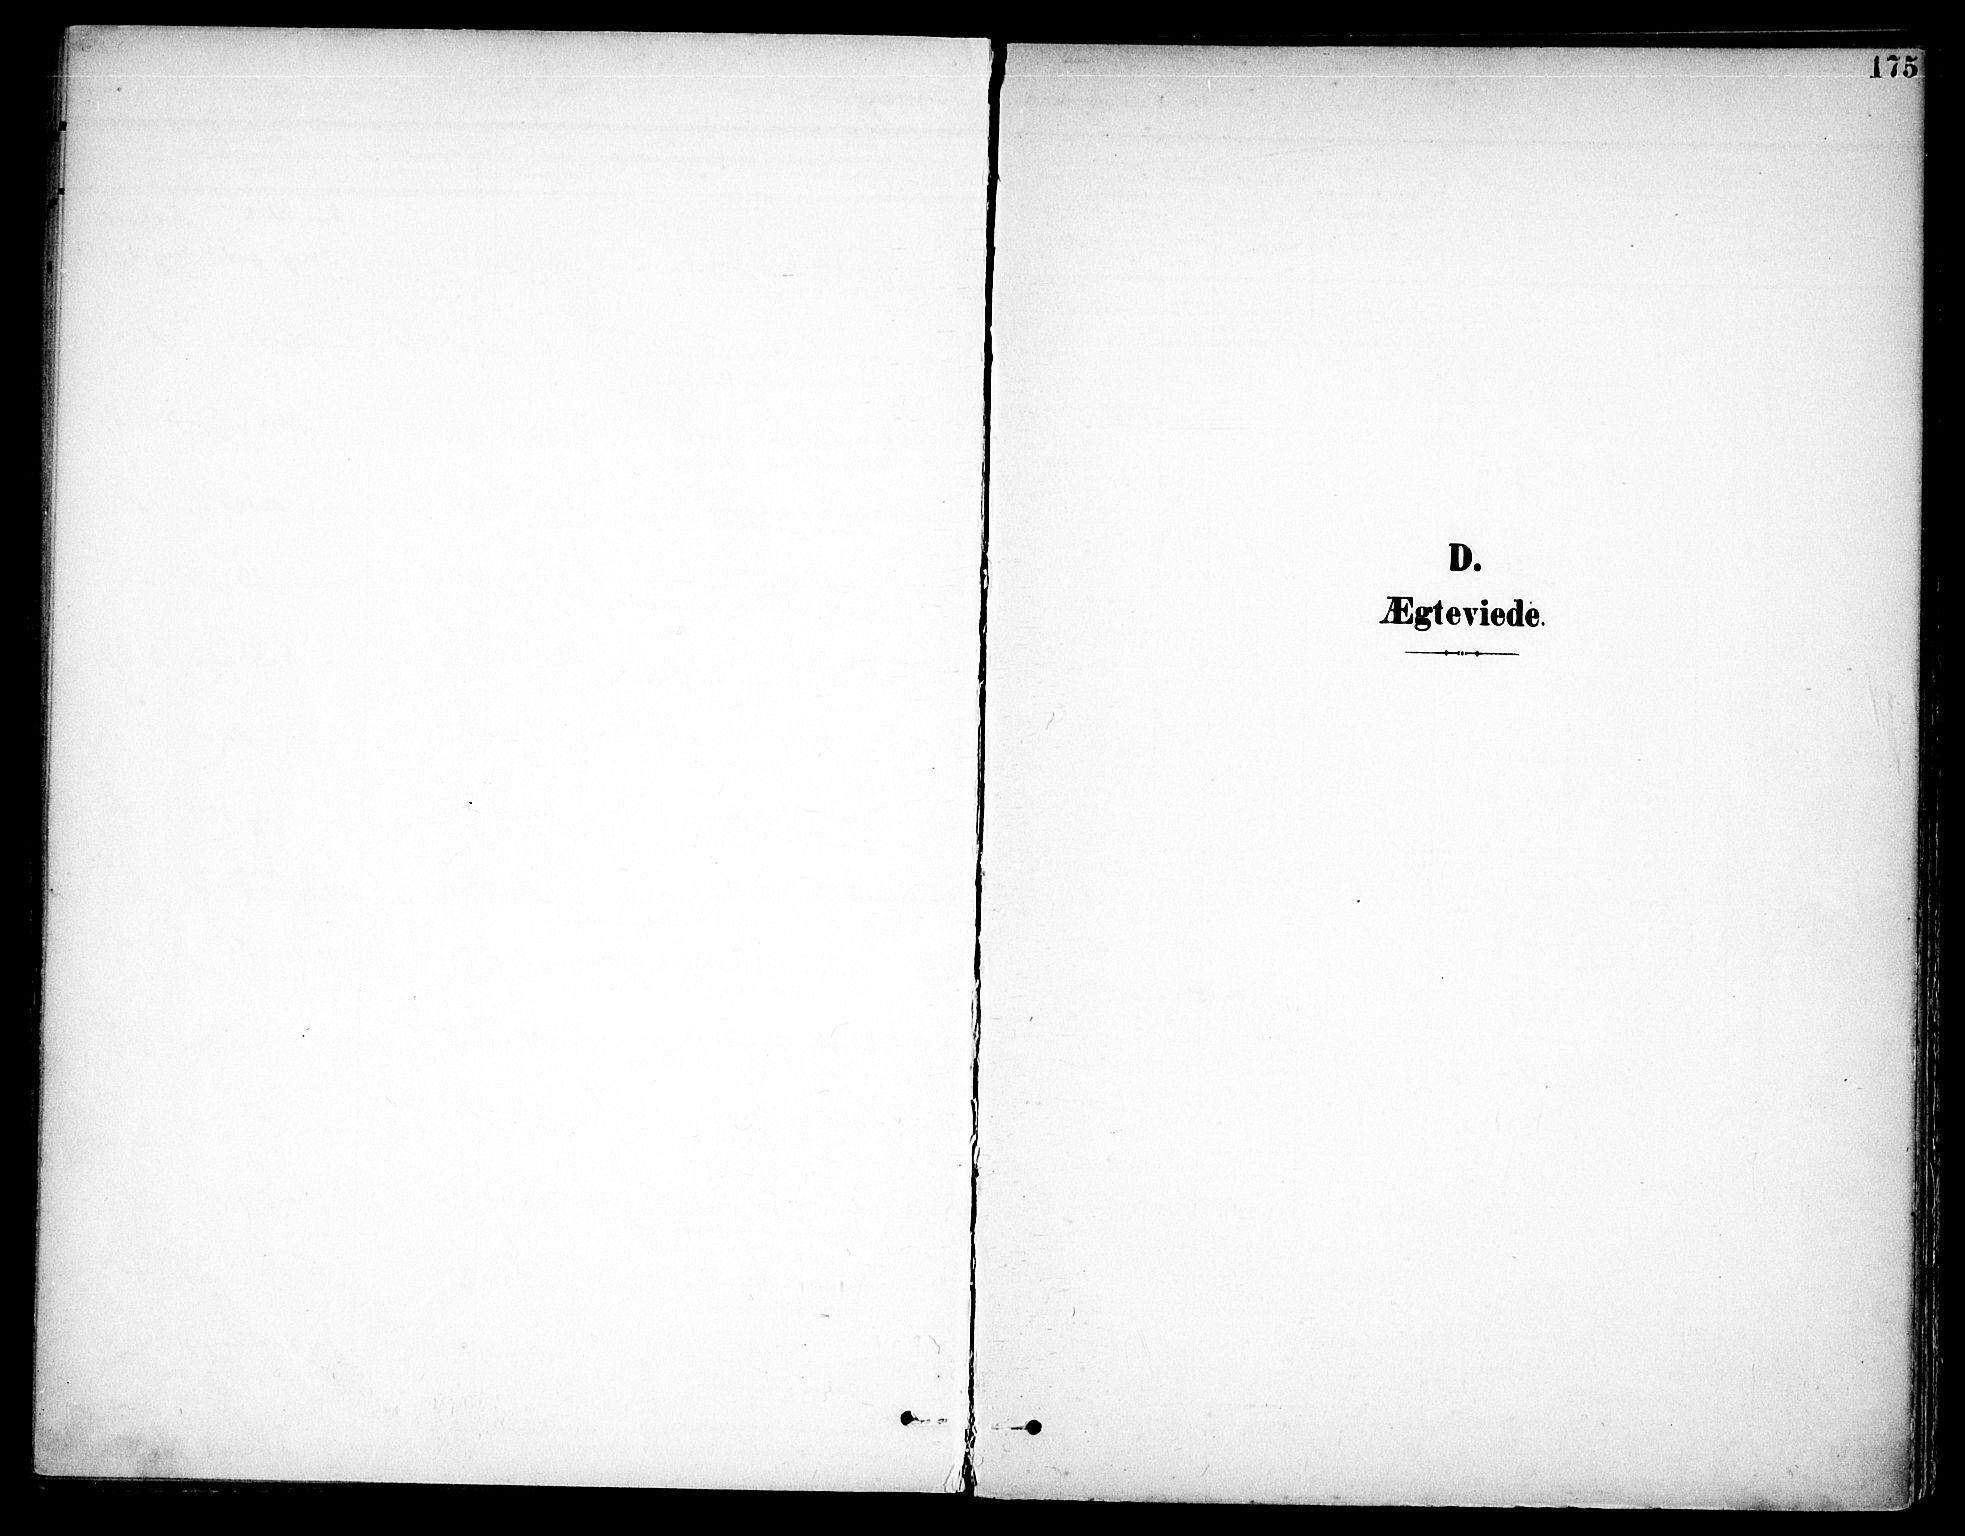 SAO, Høland prestekontor Kirkebøker, F/Fa/L0015: Ministerialbok nr. I 15, 1897-1912, s. 175